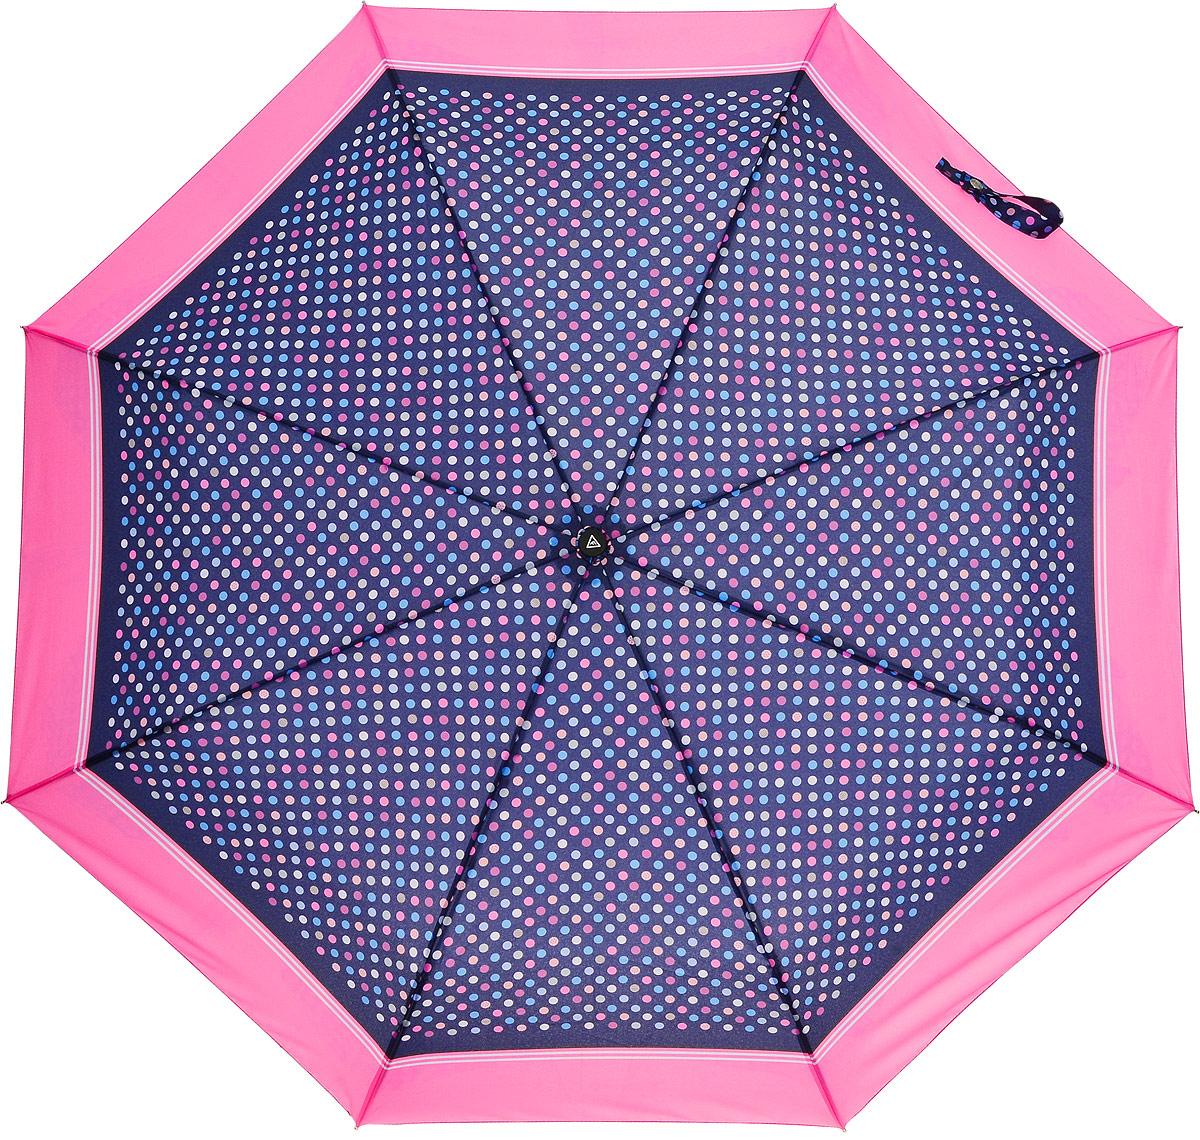 Зонт женский Fabretti, автомат, 3 сложения, цвет: синий, розовый. L-16101-3